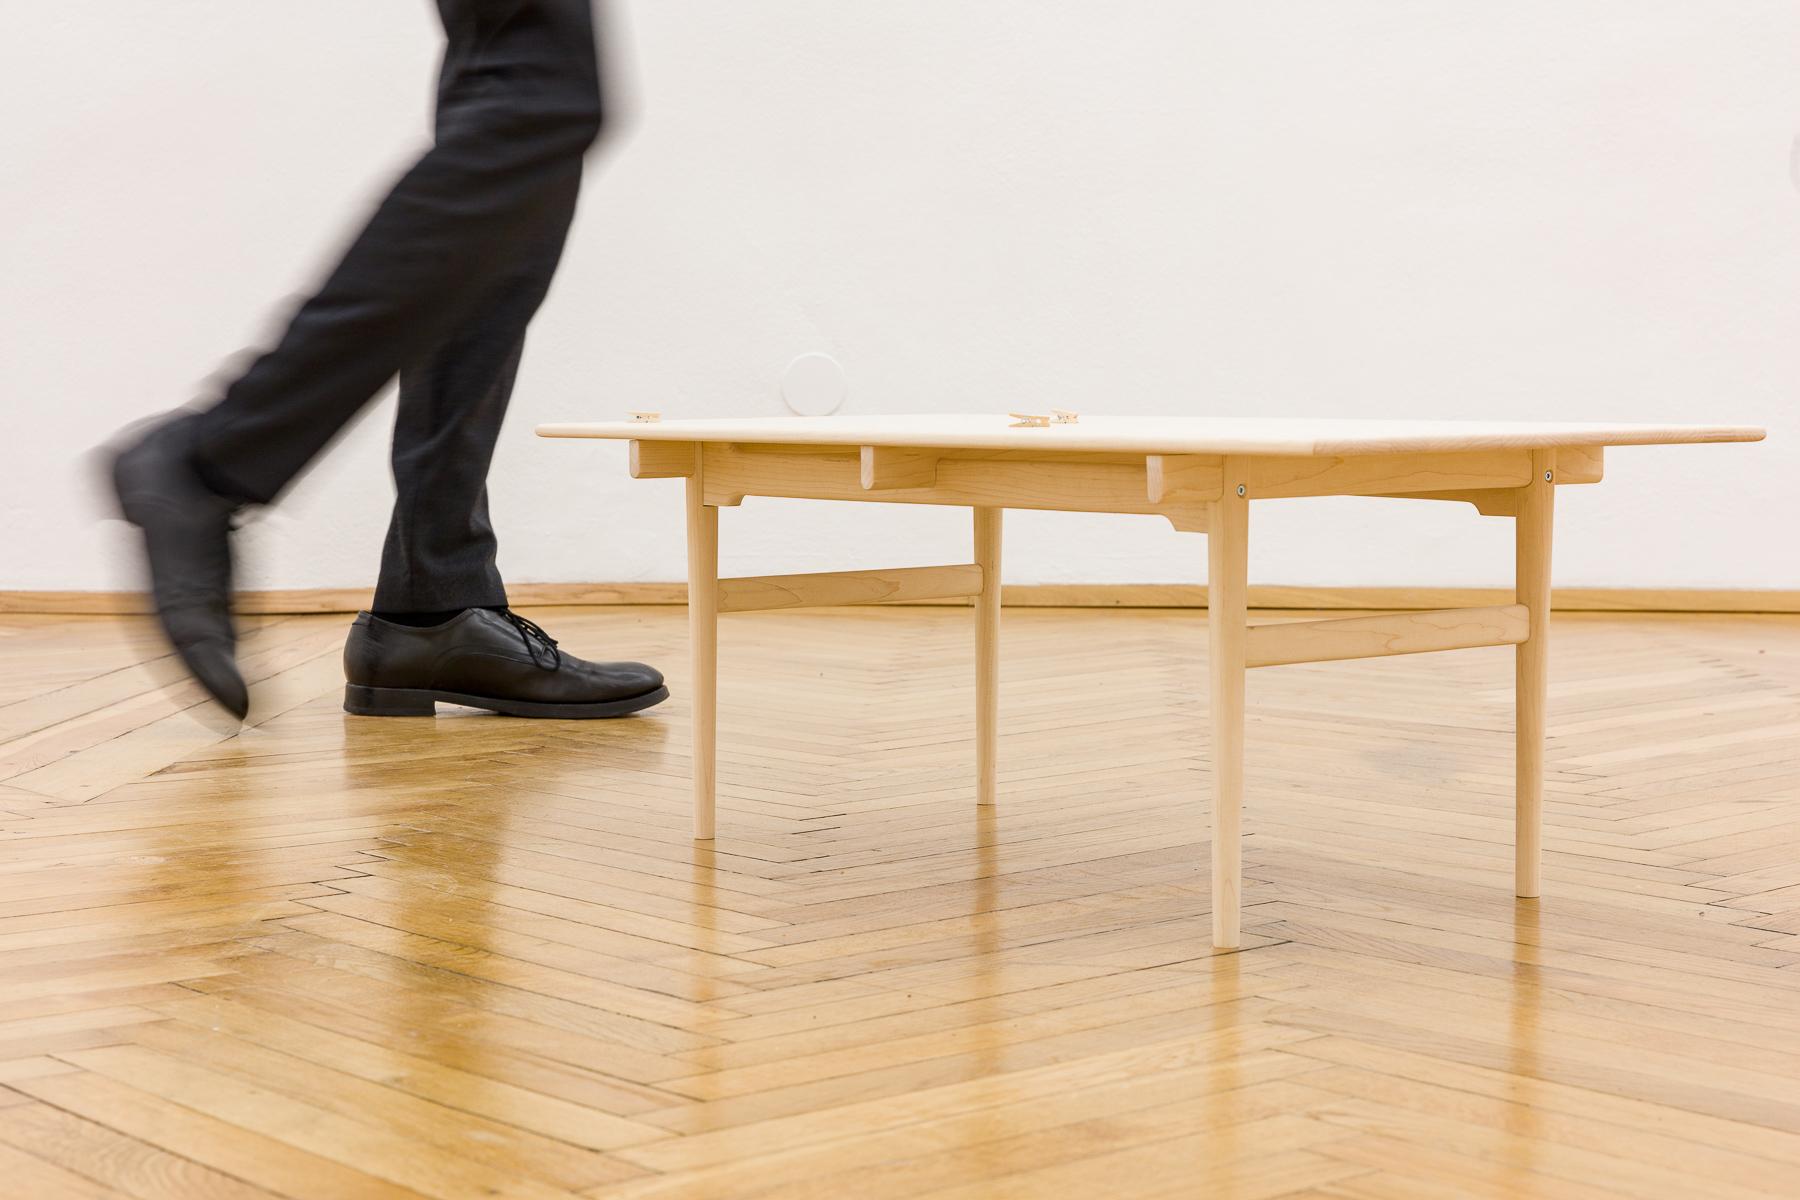 2019_01_25_Knut Ivar Aaser at Felix Gaudlitz_by kunst-dokumentationcom_016_web.jpg